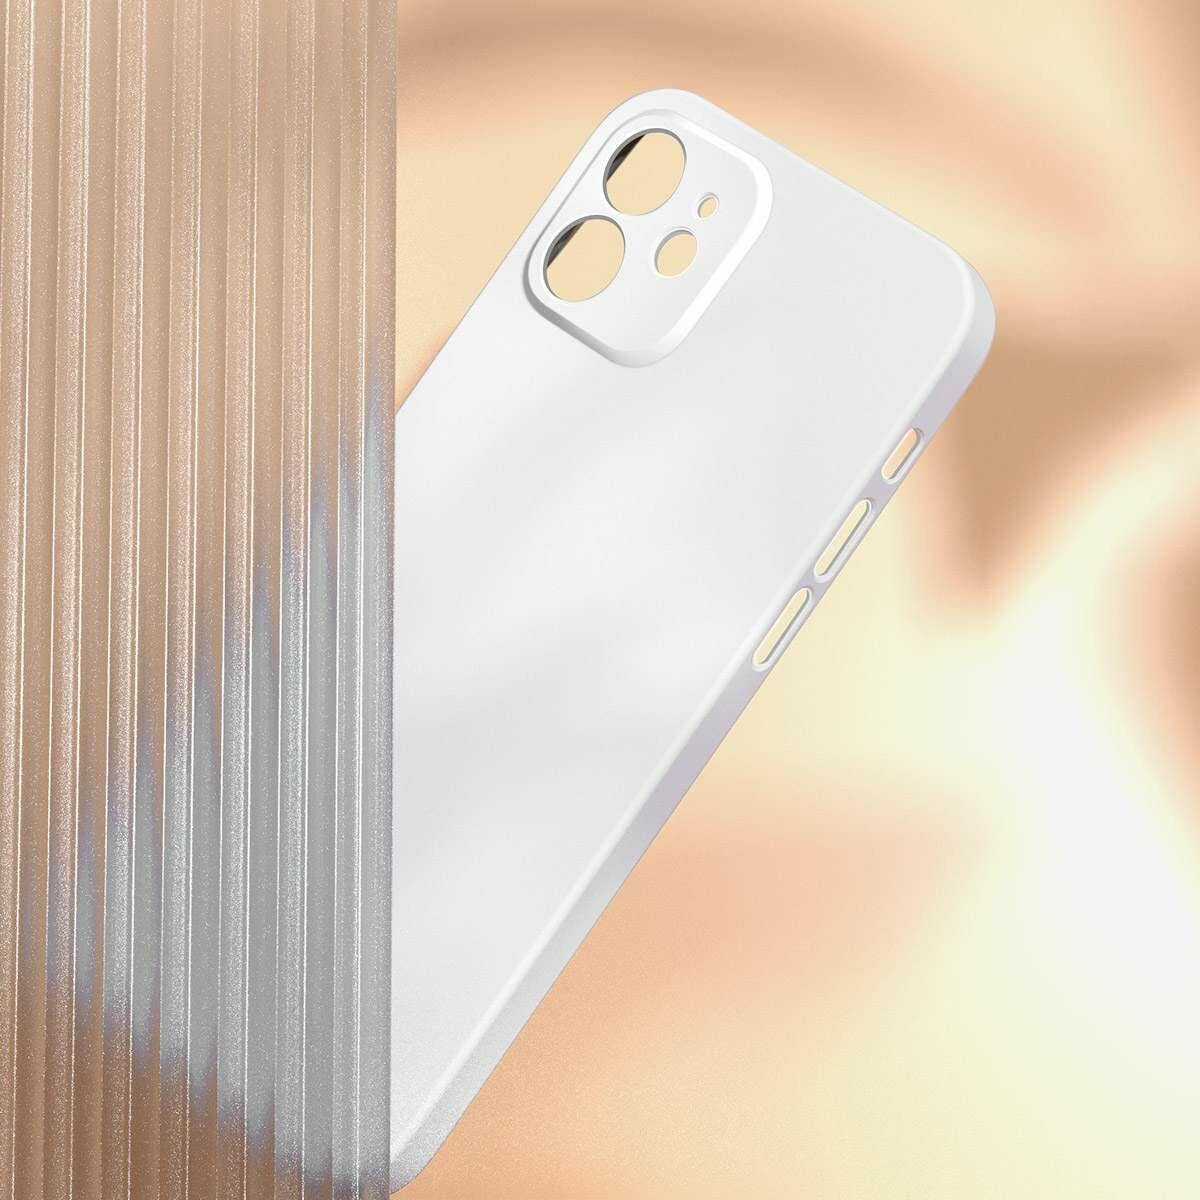 Baseus iPhone 12 Pro Max, Liquid Sillica Gel, fekete (WIAPIPH67N-YT01)